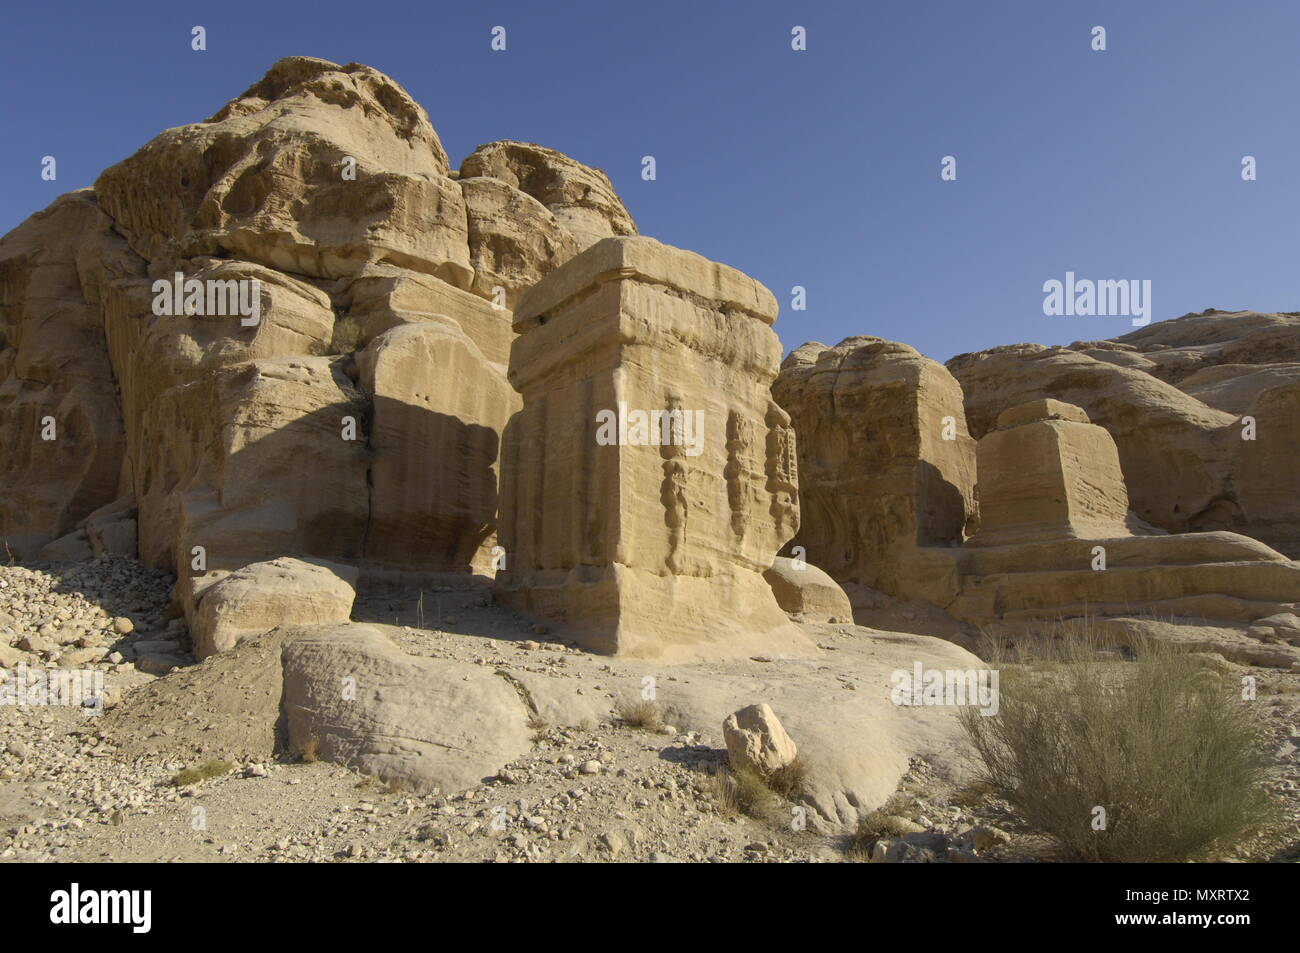 Rock grave at Petra / Jordan   Felsengrab in Petra /Jordanien Stock Photo